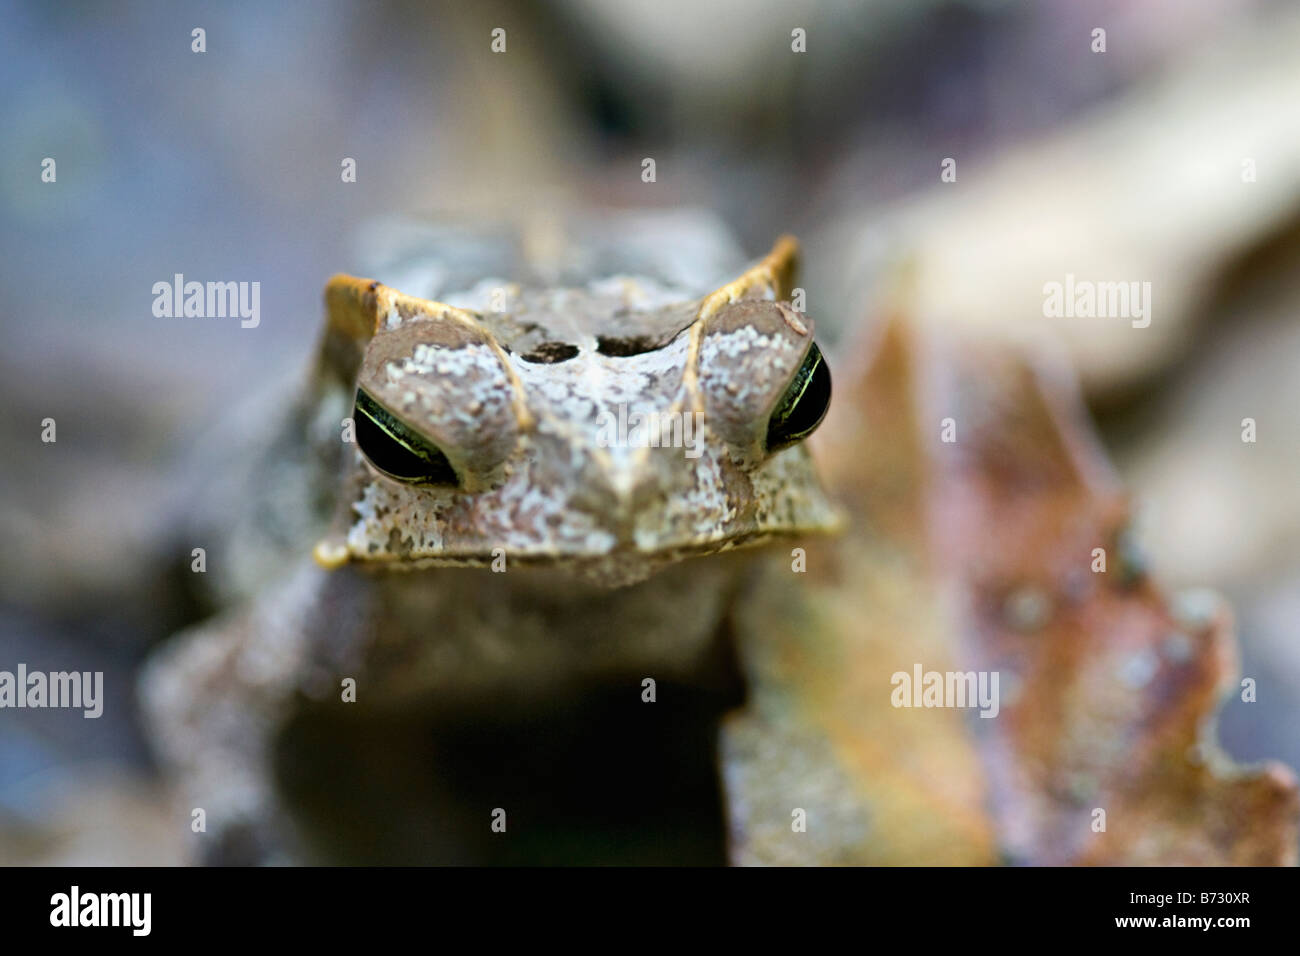 Suriname, Brownsweg, Brownsberg Parque Nacional. Sapo cornuda. Imagen De Stock